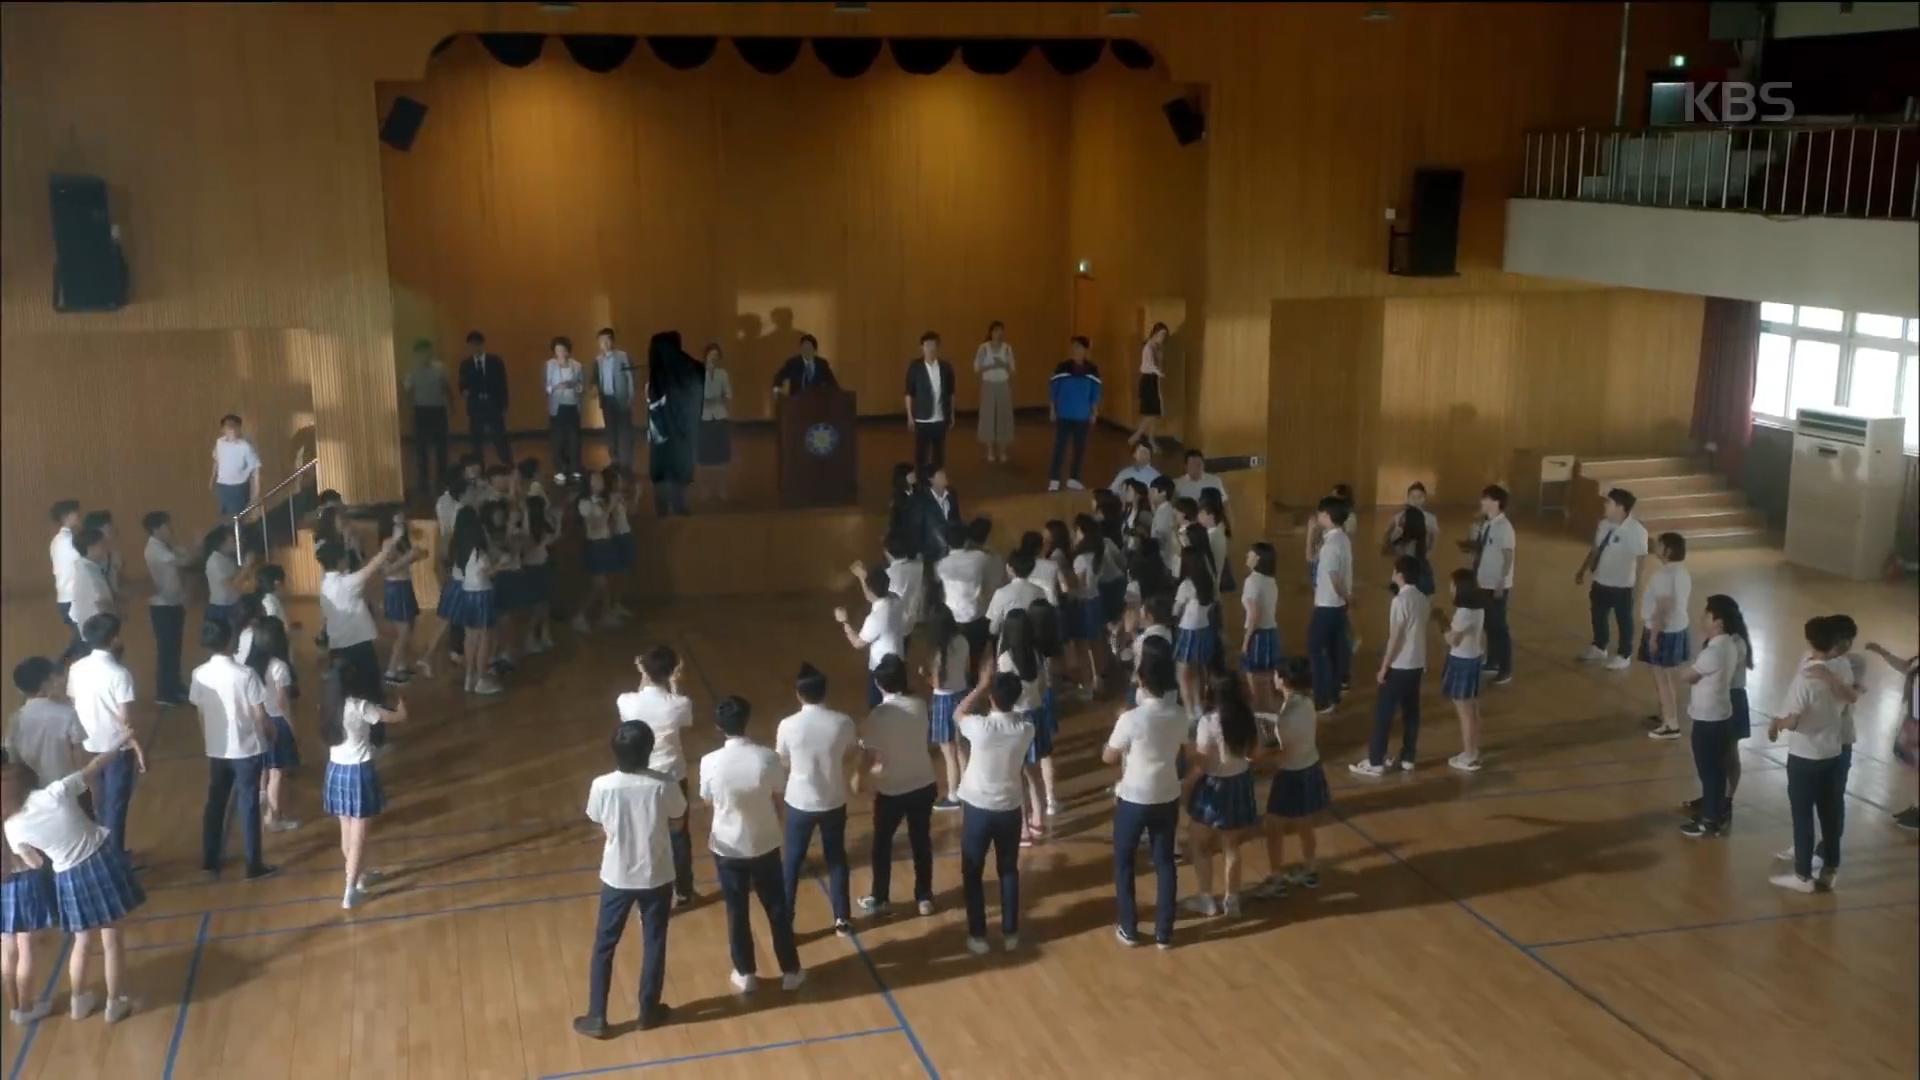 School 2017 - Drone